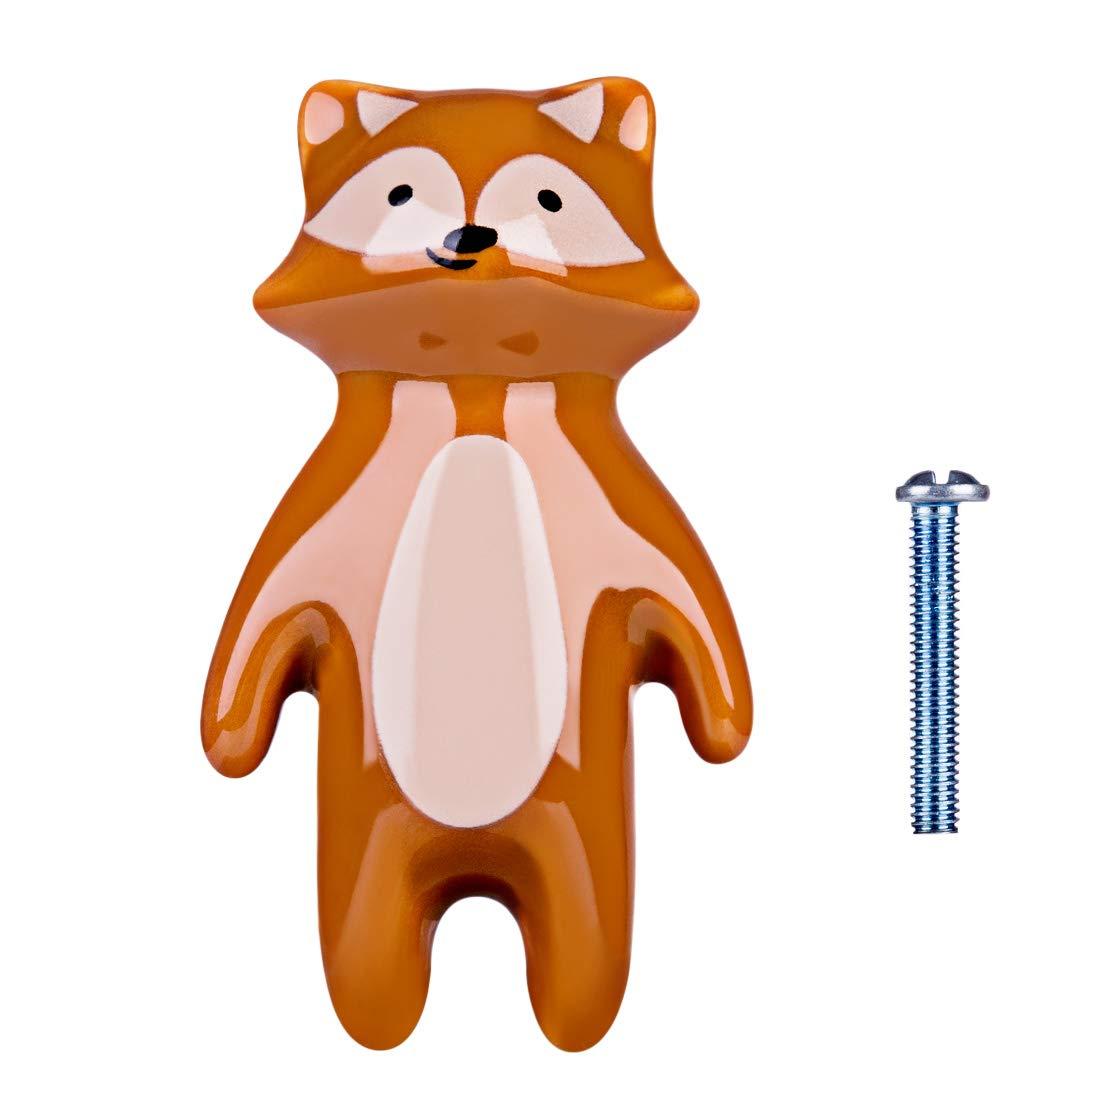 Batop 6Pcs M/öbelkn/öpfe Kinderzimmer Fuchs Kinder Keramik M/öbelkn/öpfe mit Tier Motiv Schrankgriffe T/ürkn/öpfe Schrankkn/öpfe Griff Knopf